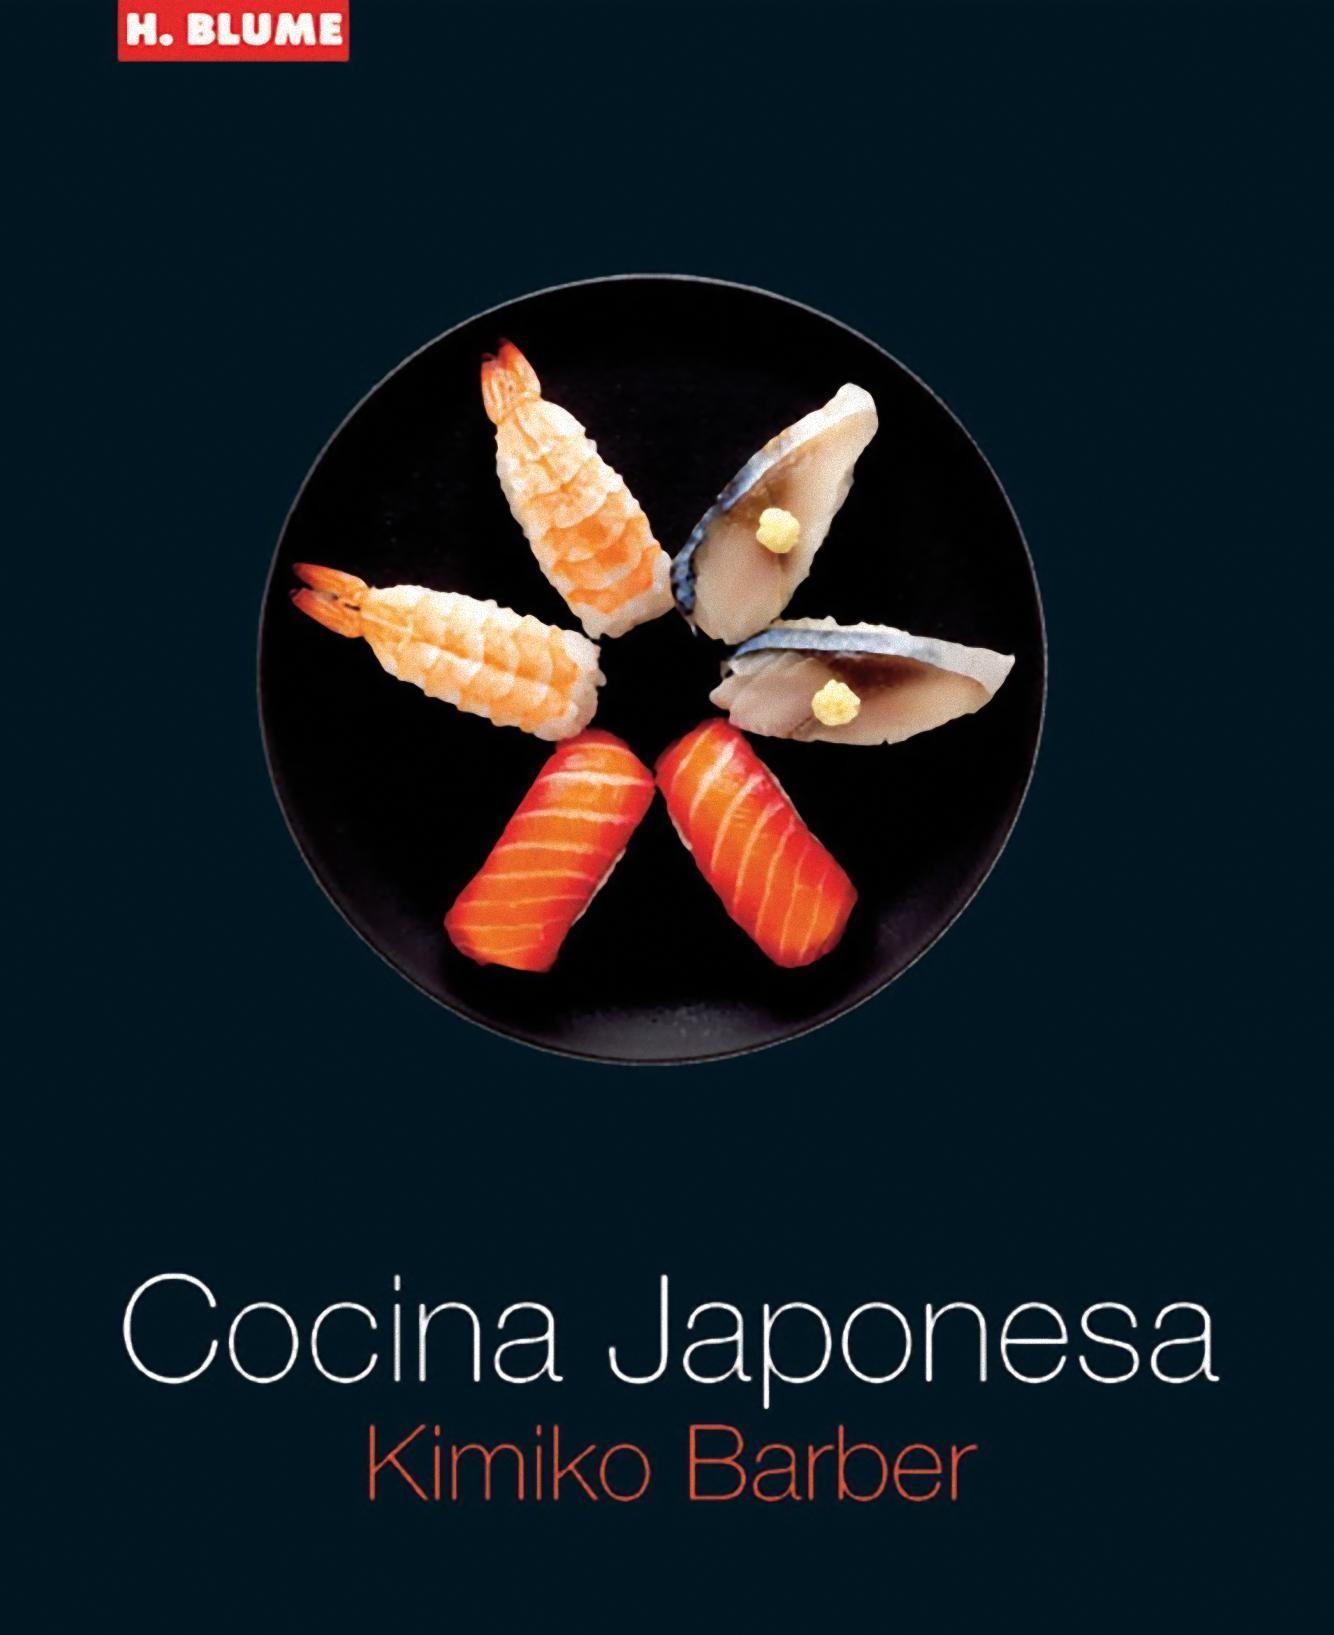 Cocina japonesa de Kimiko Barber